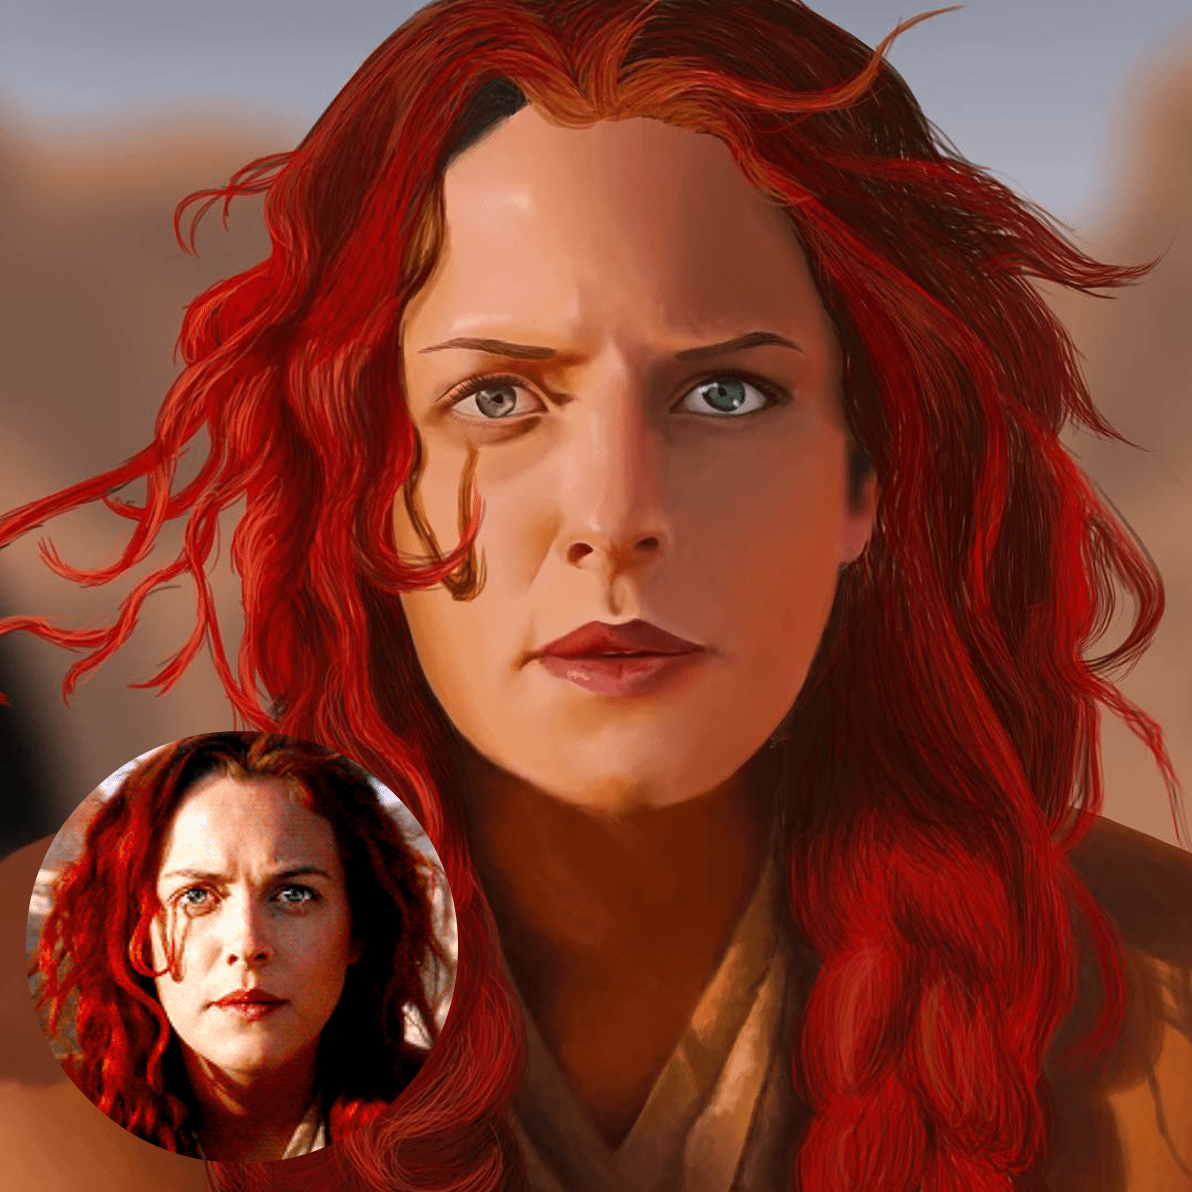 Portrait Sample by Jenn Peterson